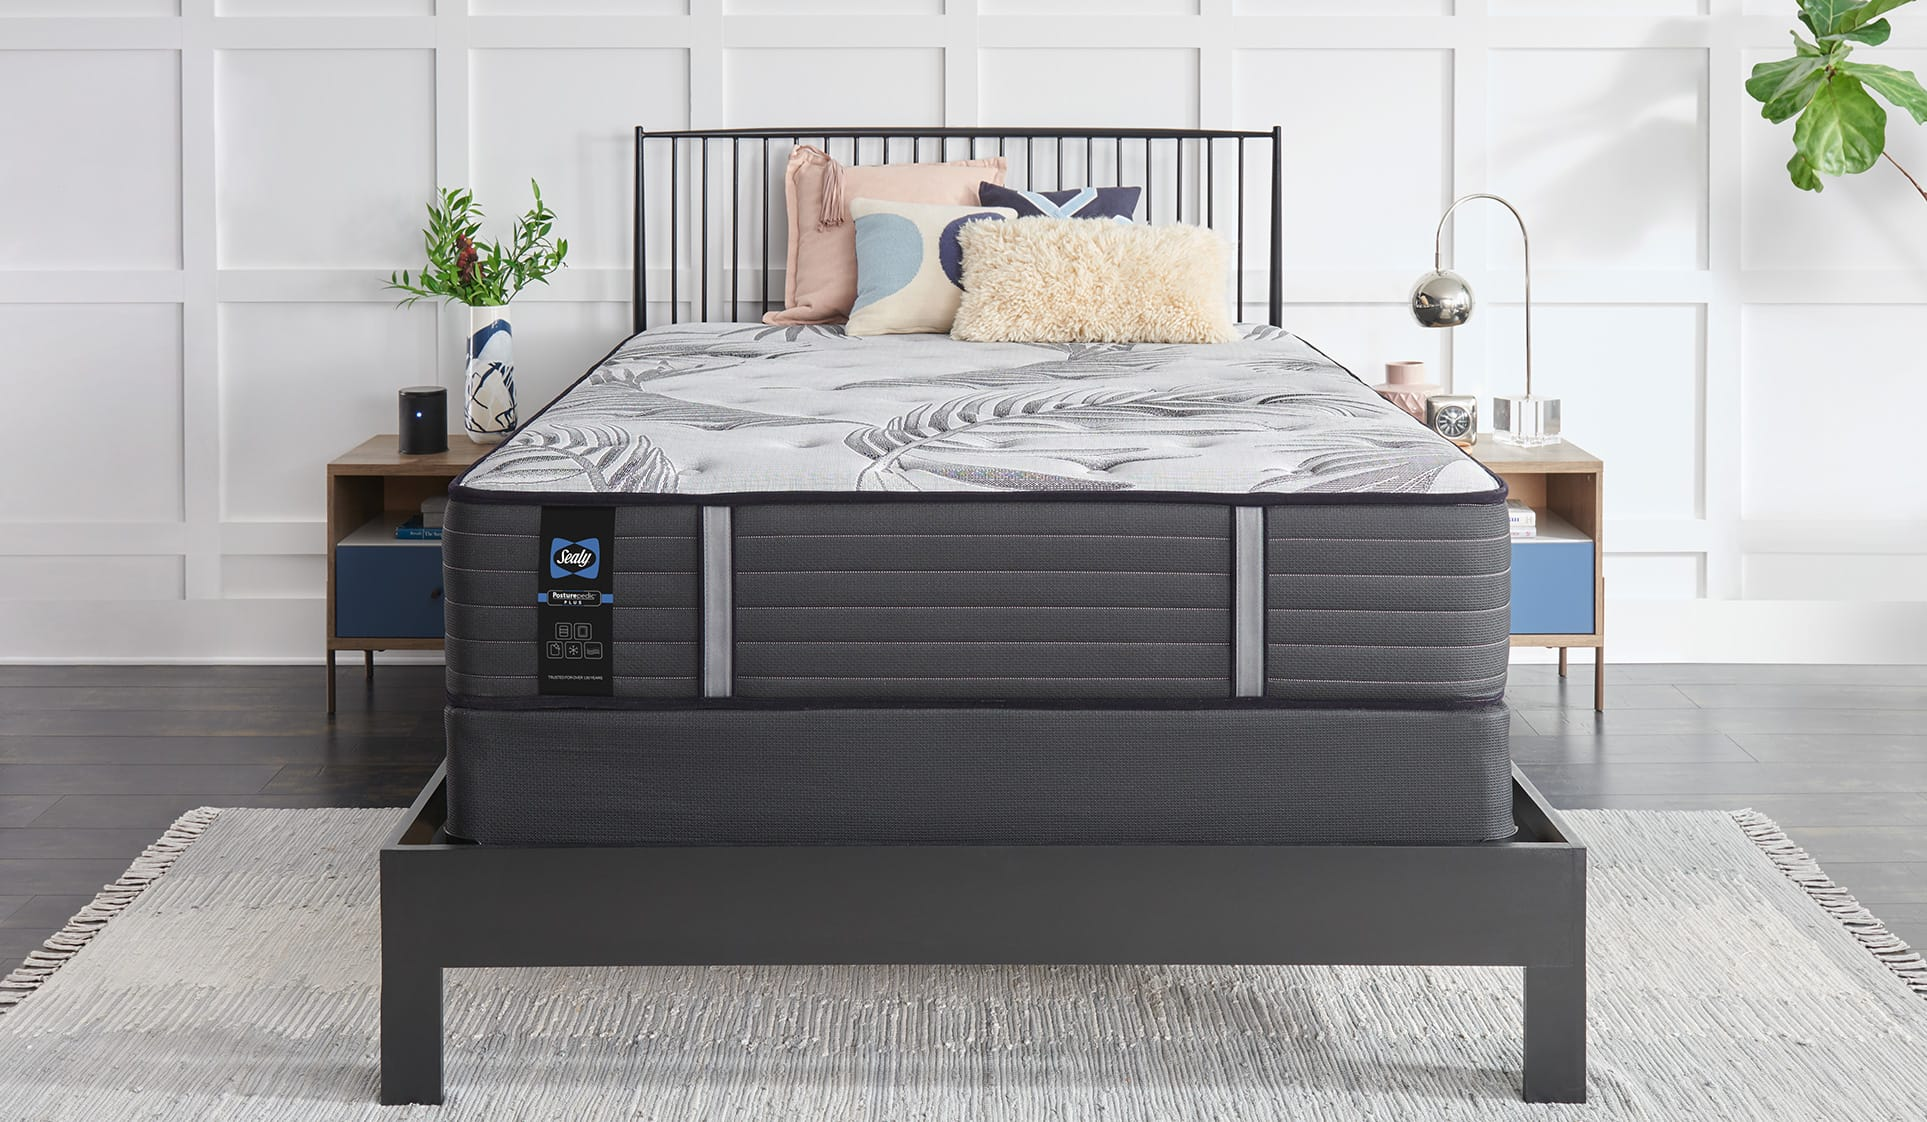 Sealy Posturepedic® Plus mattress in a bedroom